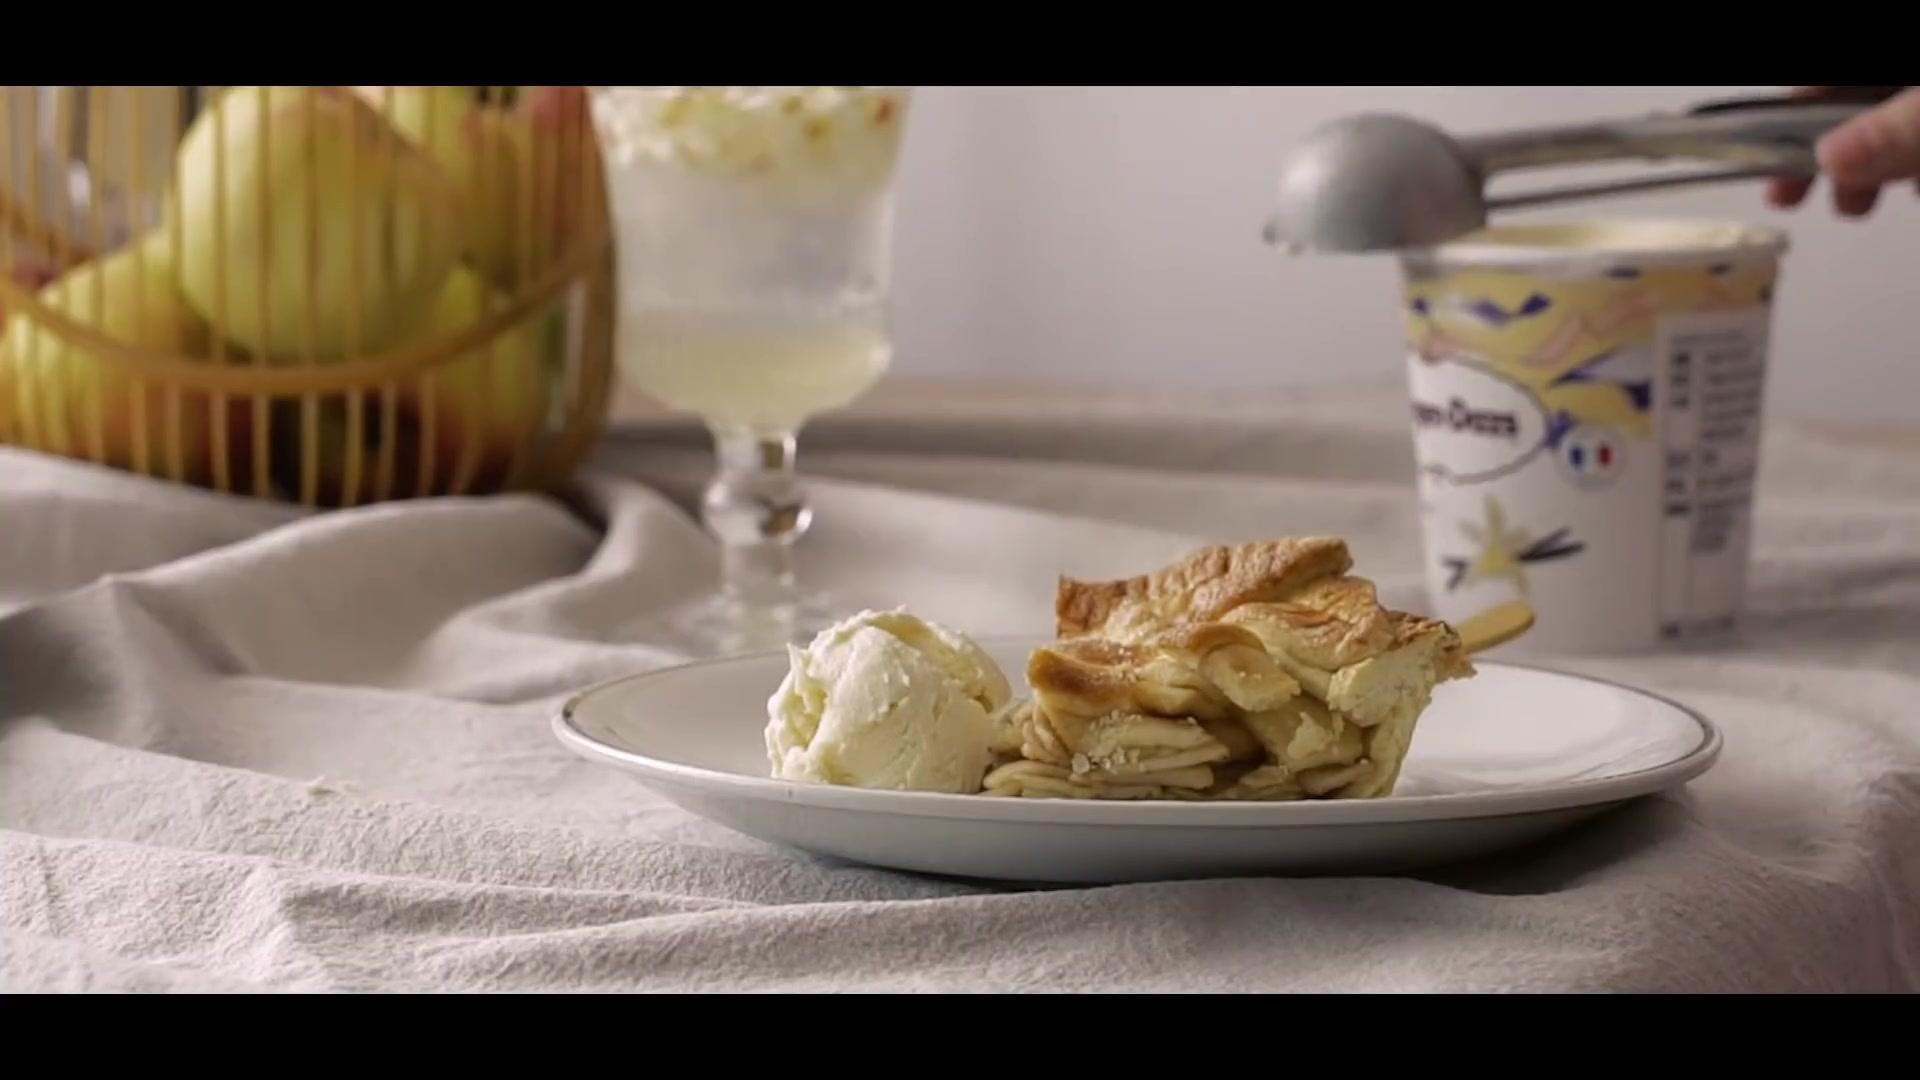 Honeykki Episode 216: Season Bakery - Apple Pie [Honeykki]